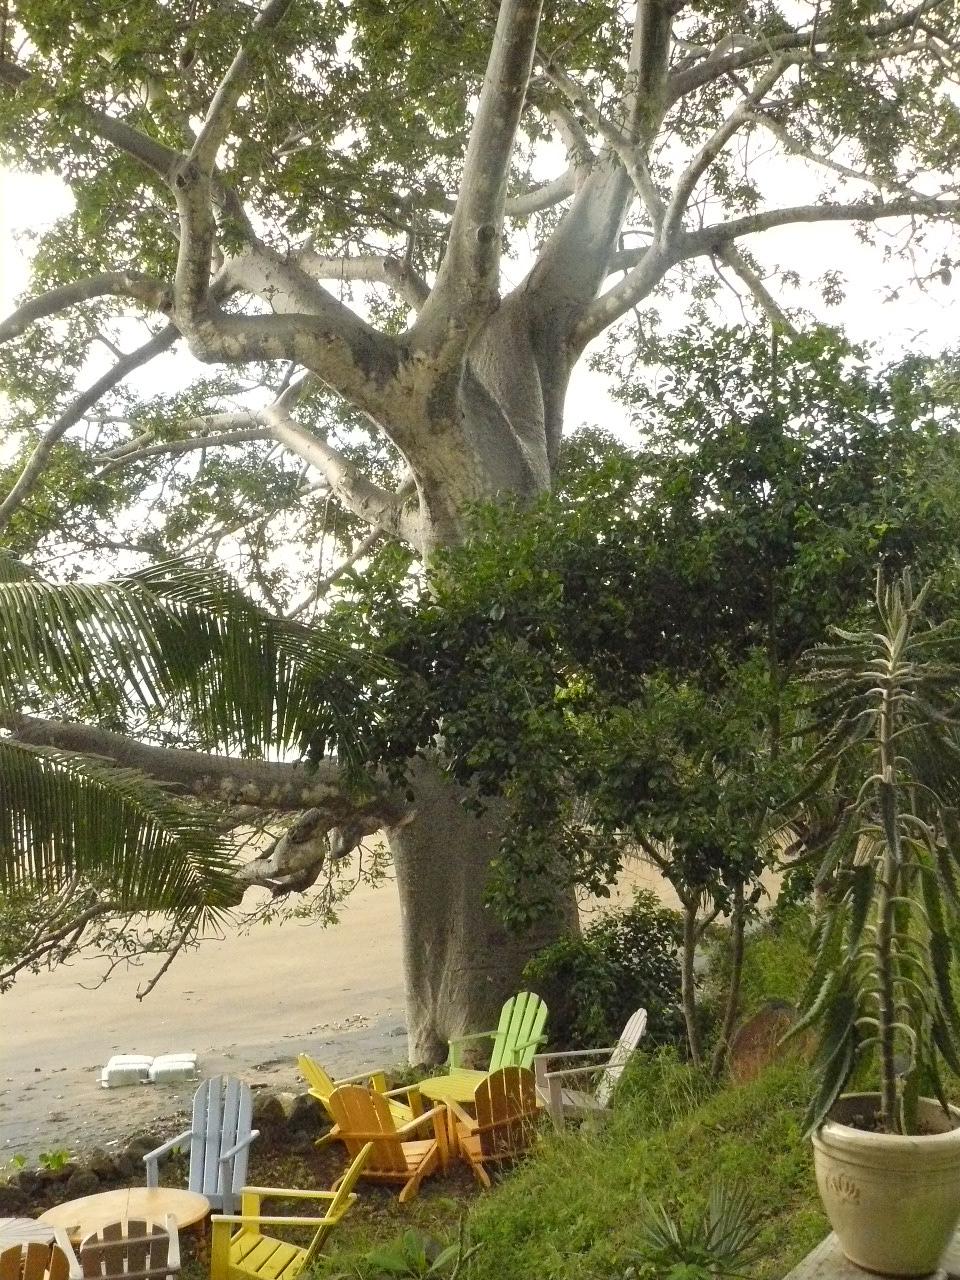 Mayotte_Combani_Bamboo_Géants_39